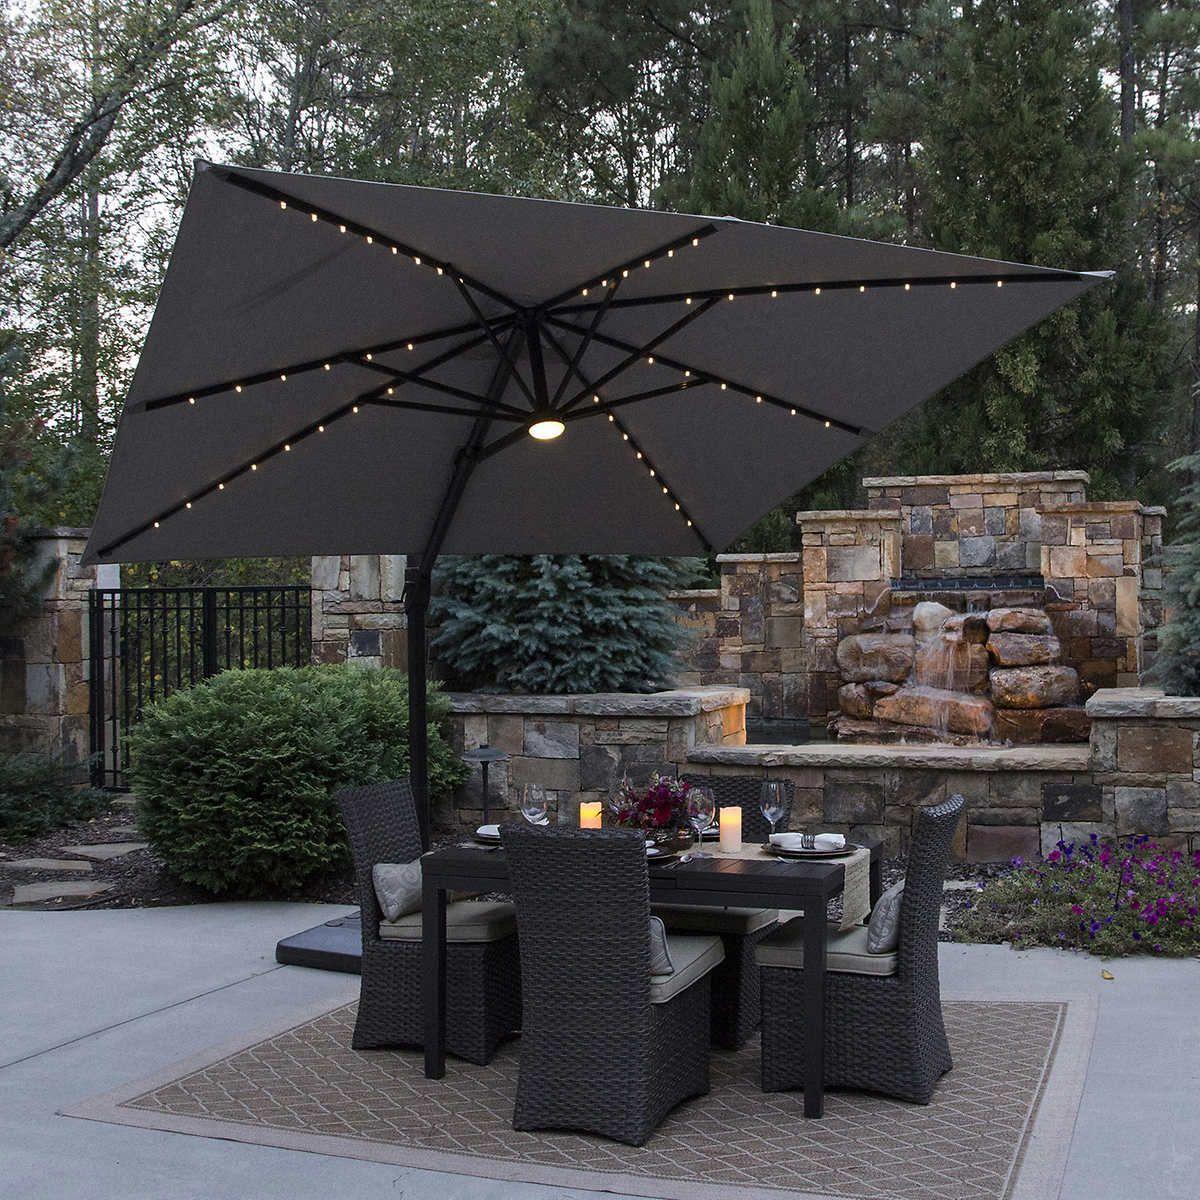 solar powered lit patio umbrella